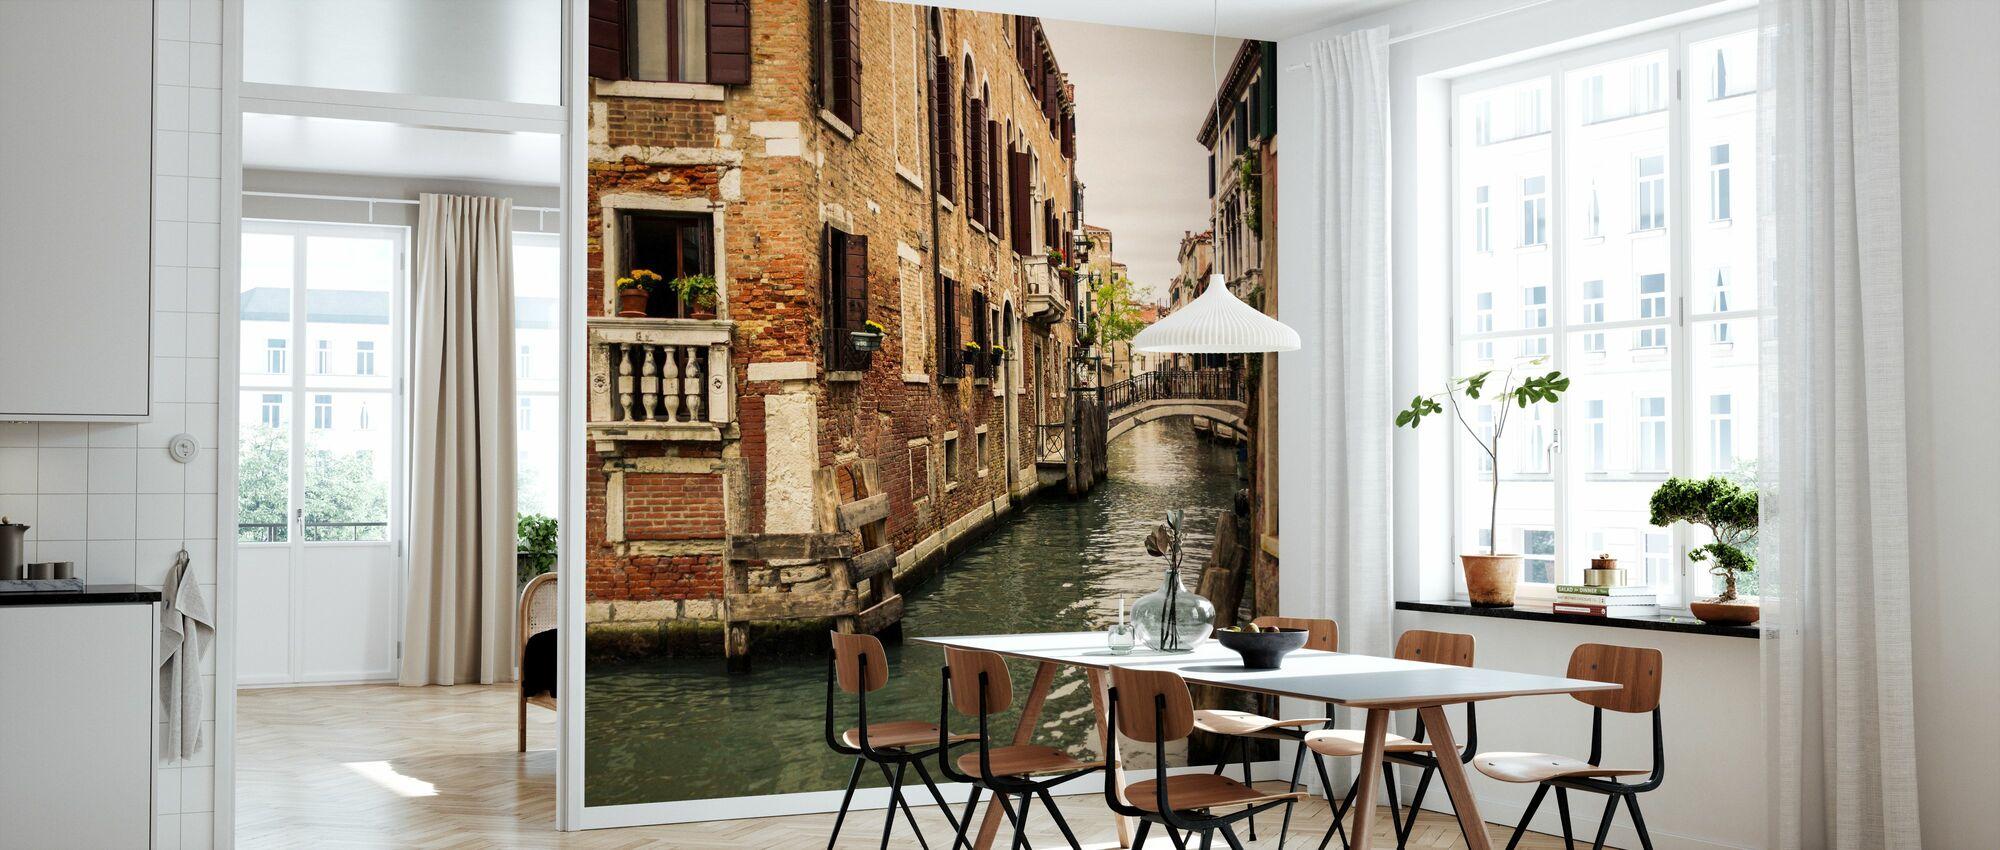 Bricks and Bridges in Venice - Wallpaper - Kitchen